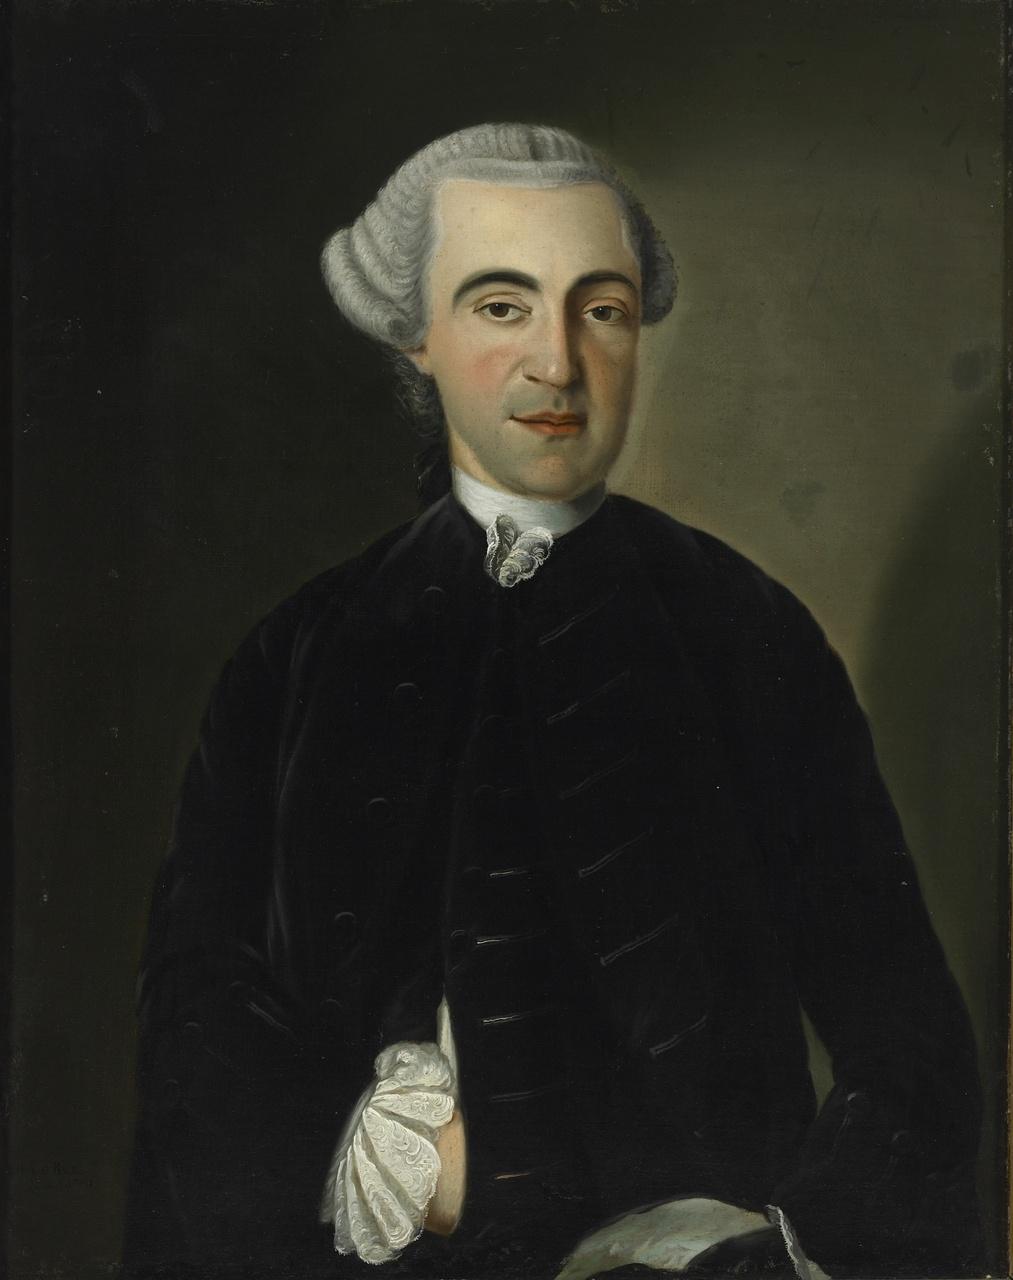 Mr. M.C. Versluys (1723-1811), gehuwd met  Versluys, Magdalena Cornelia, H.A.C.H. Baur